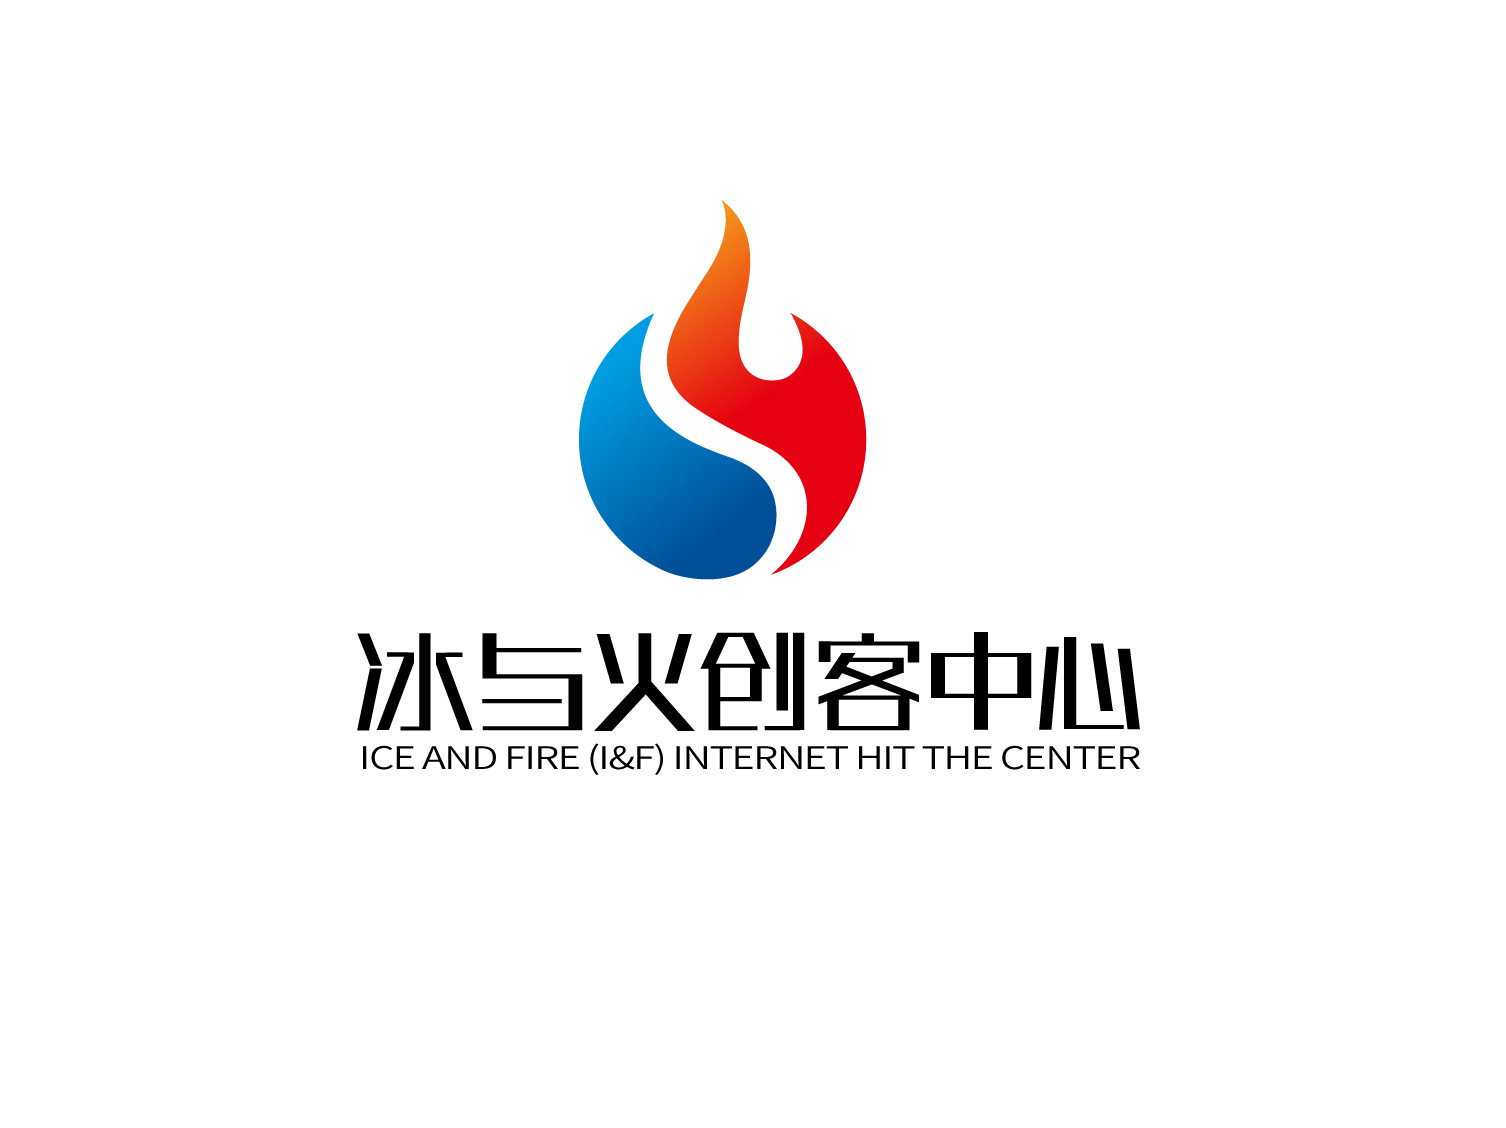 成�yi)�-f_i&f)互联网创客中心logo设计